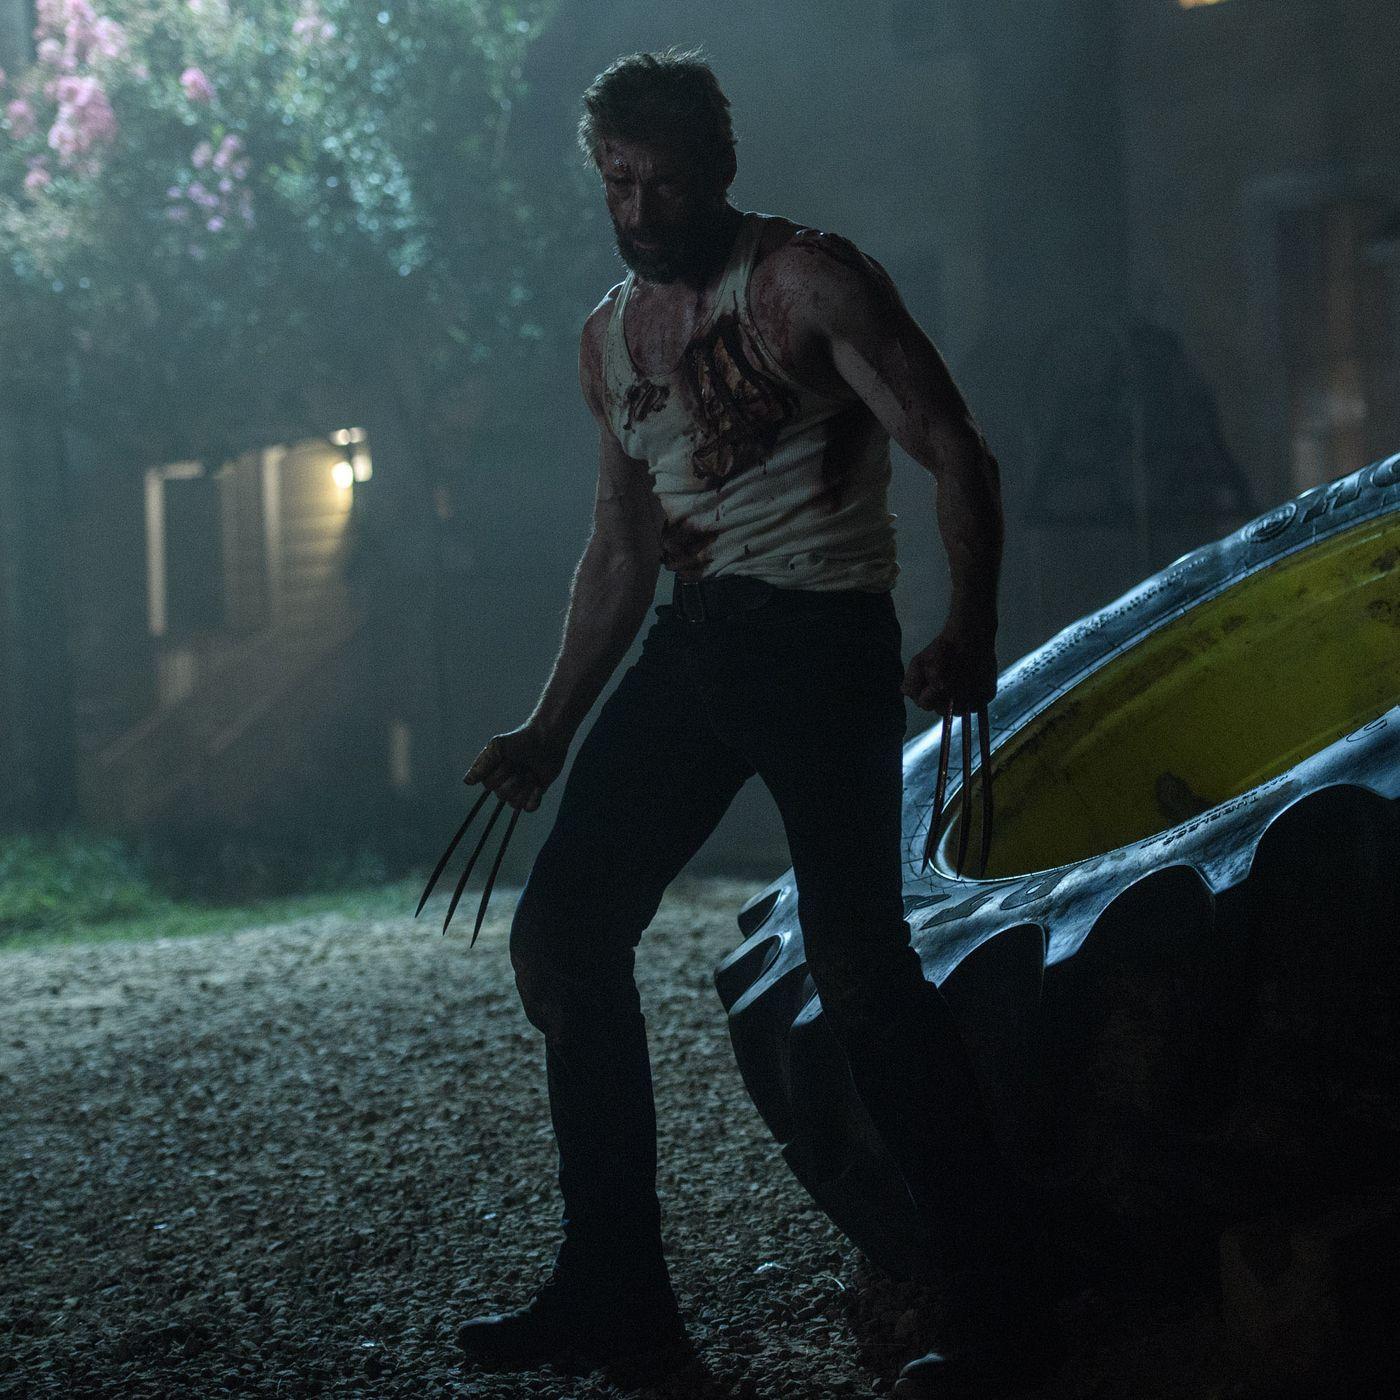 Logan review: ไม่ใช่แค่หนัง X-Men ที่ดุเดือดที่สุด แต่ยังเป็นเรื่องที่เศร้าที่สุดด้วย